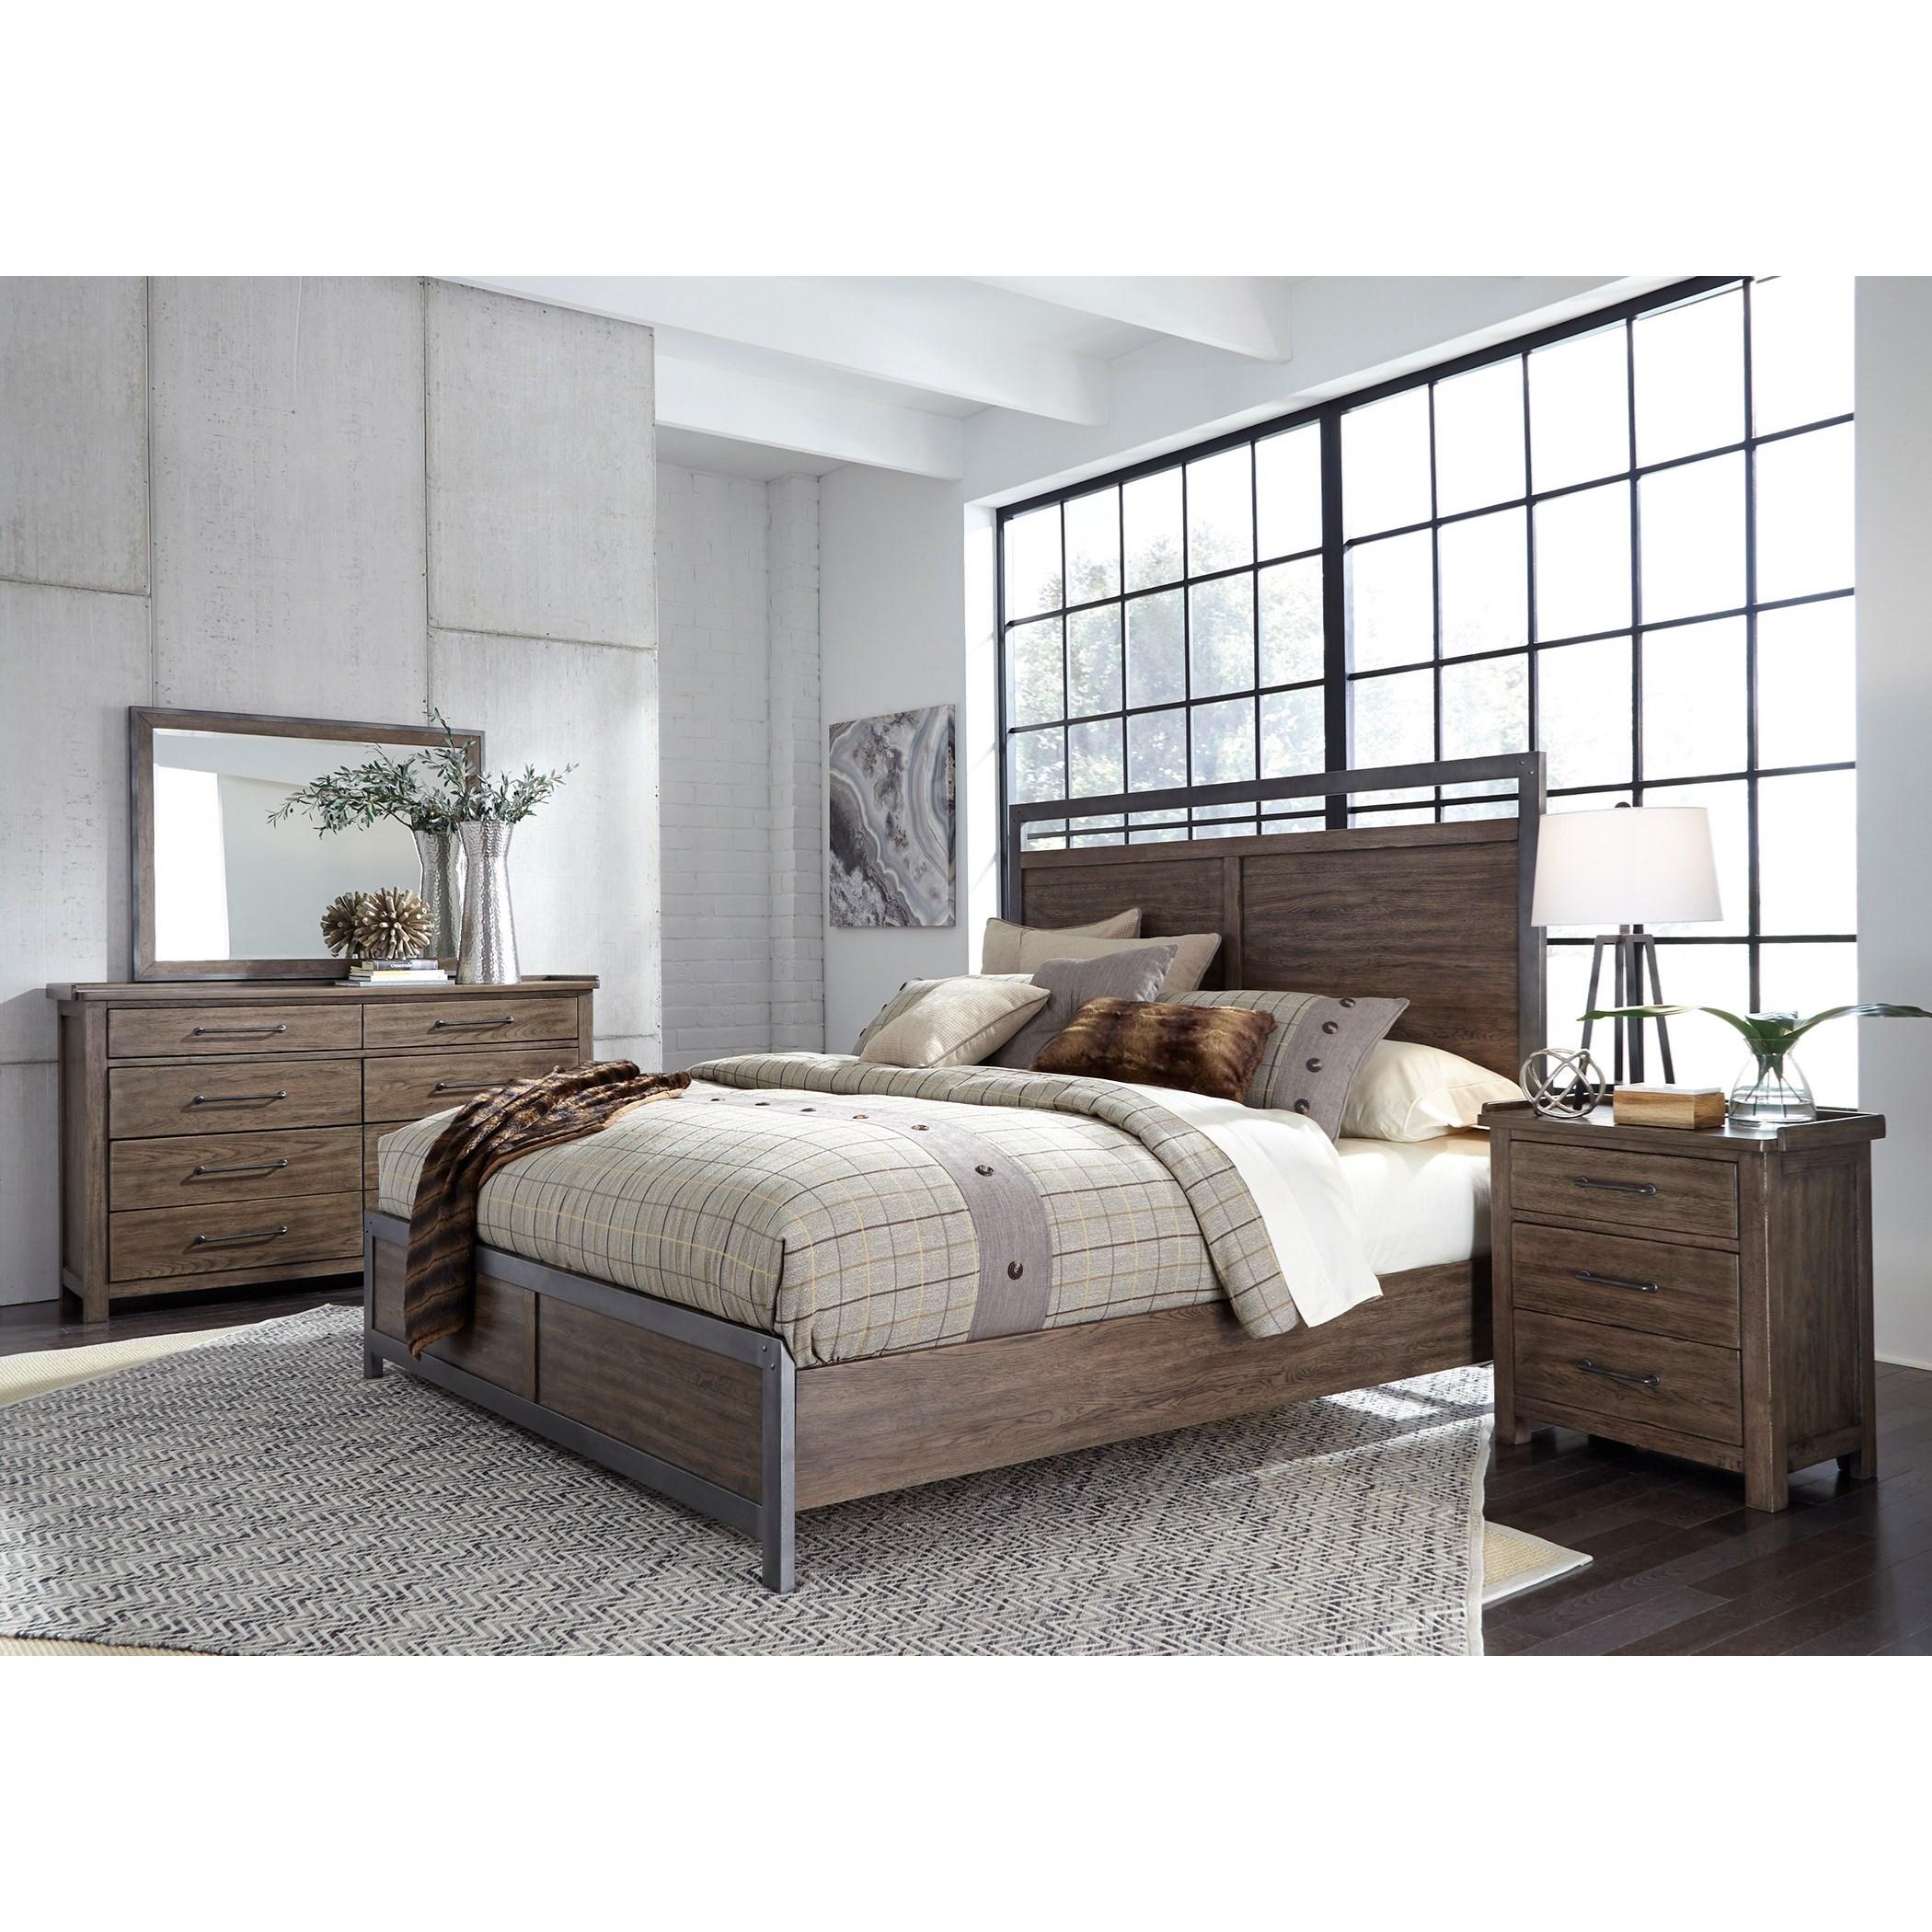 Liberty furniture sonoma road 473 br qpbdmn queen bedroom for Bedroom groups